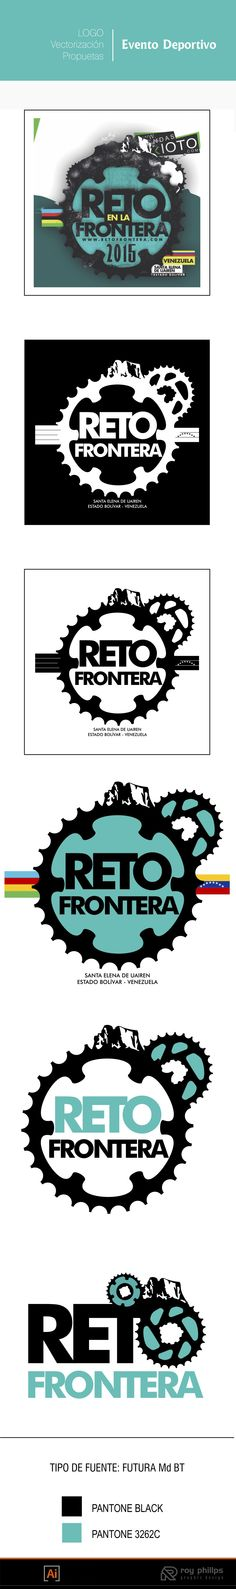 RETO FRONTERA, Evento Deportivo, Santa Elena de Uairen - Venezuela